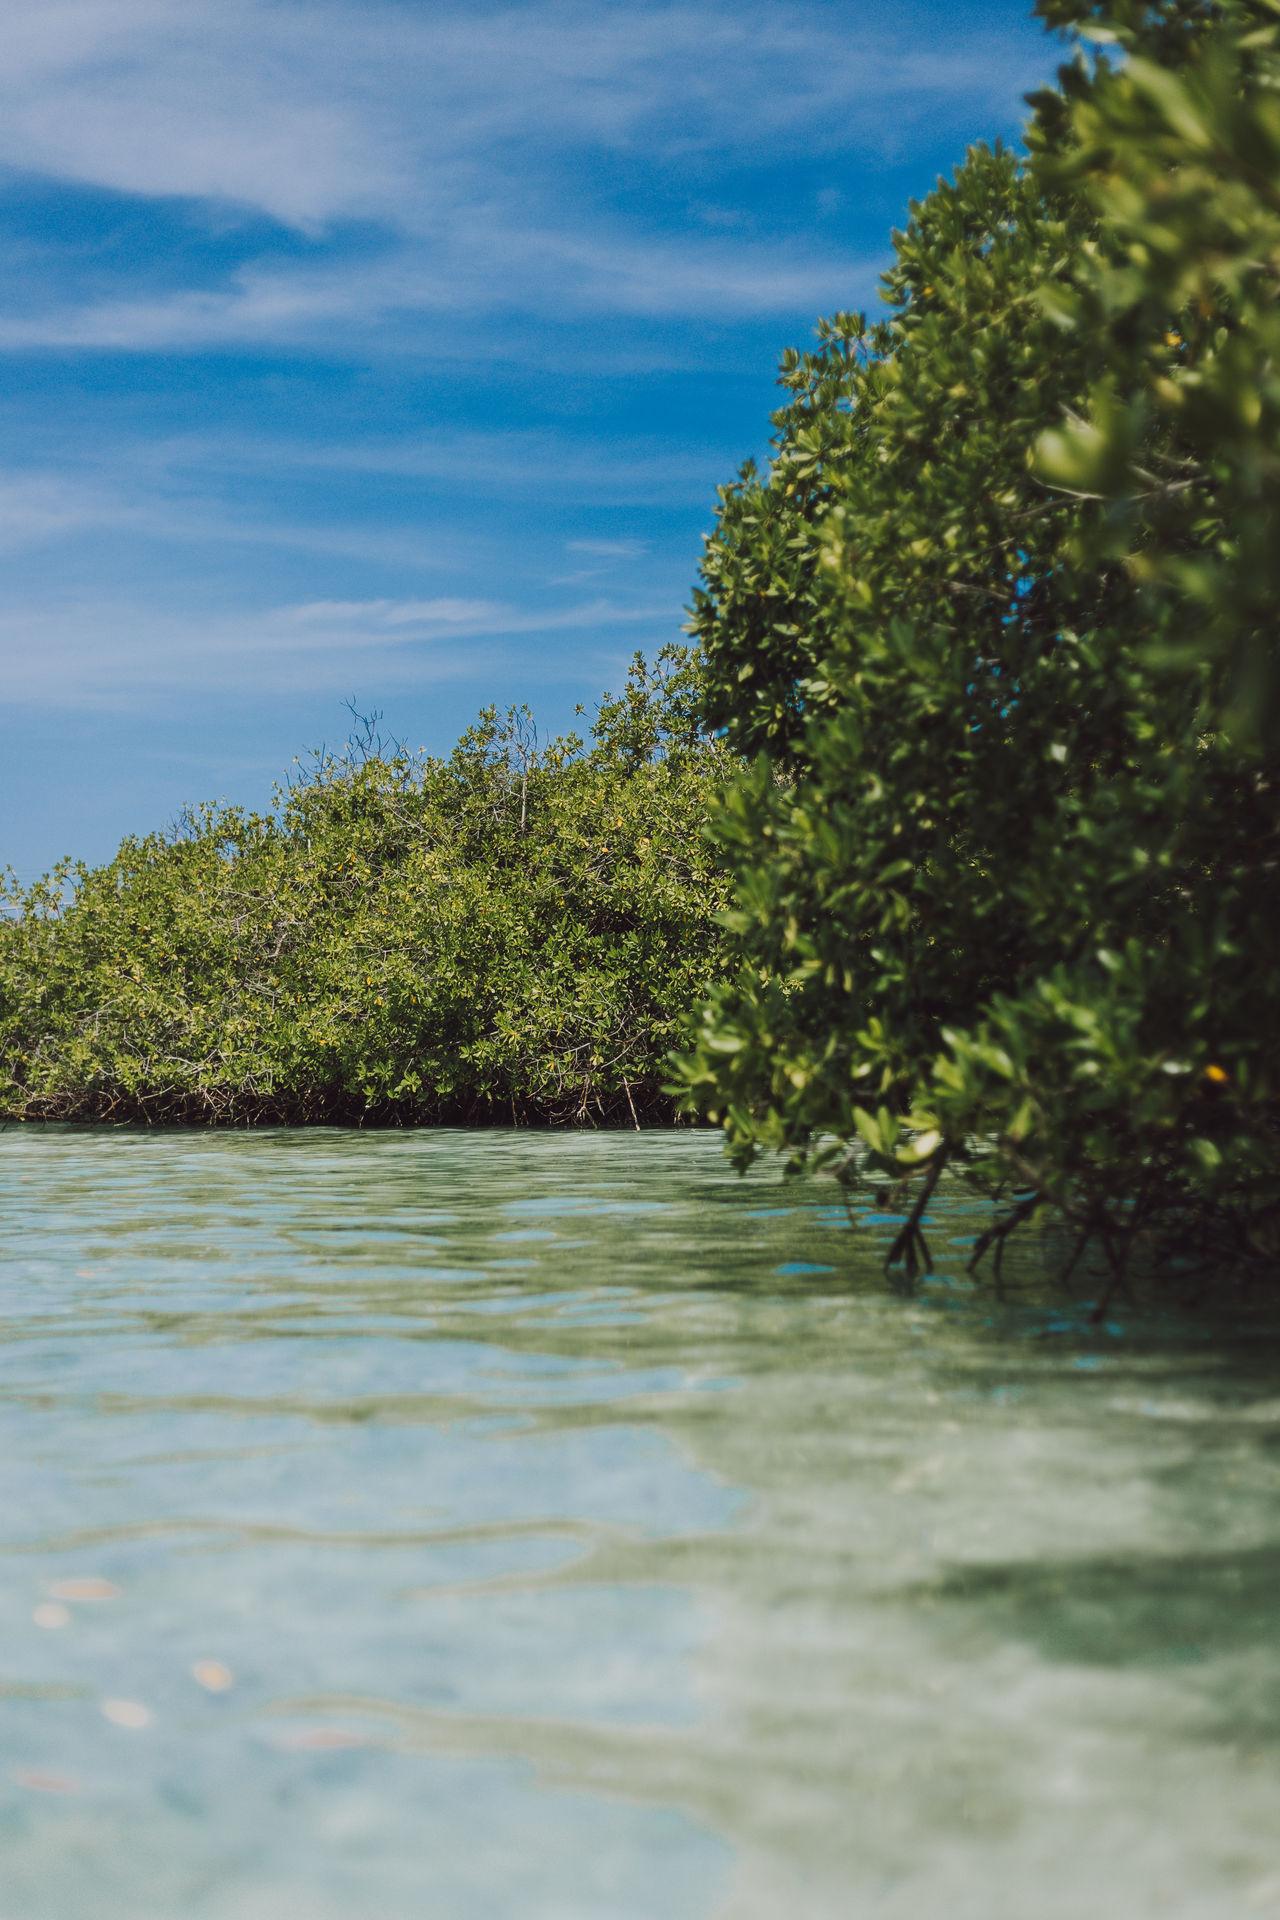 Mangroves in Aruba Aruba Beach Beauty In Nature Mangrove Mangroves Nature No People Outdoors Sky Tranquility Tree Water Waterfront